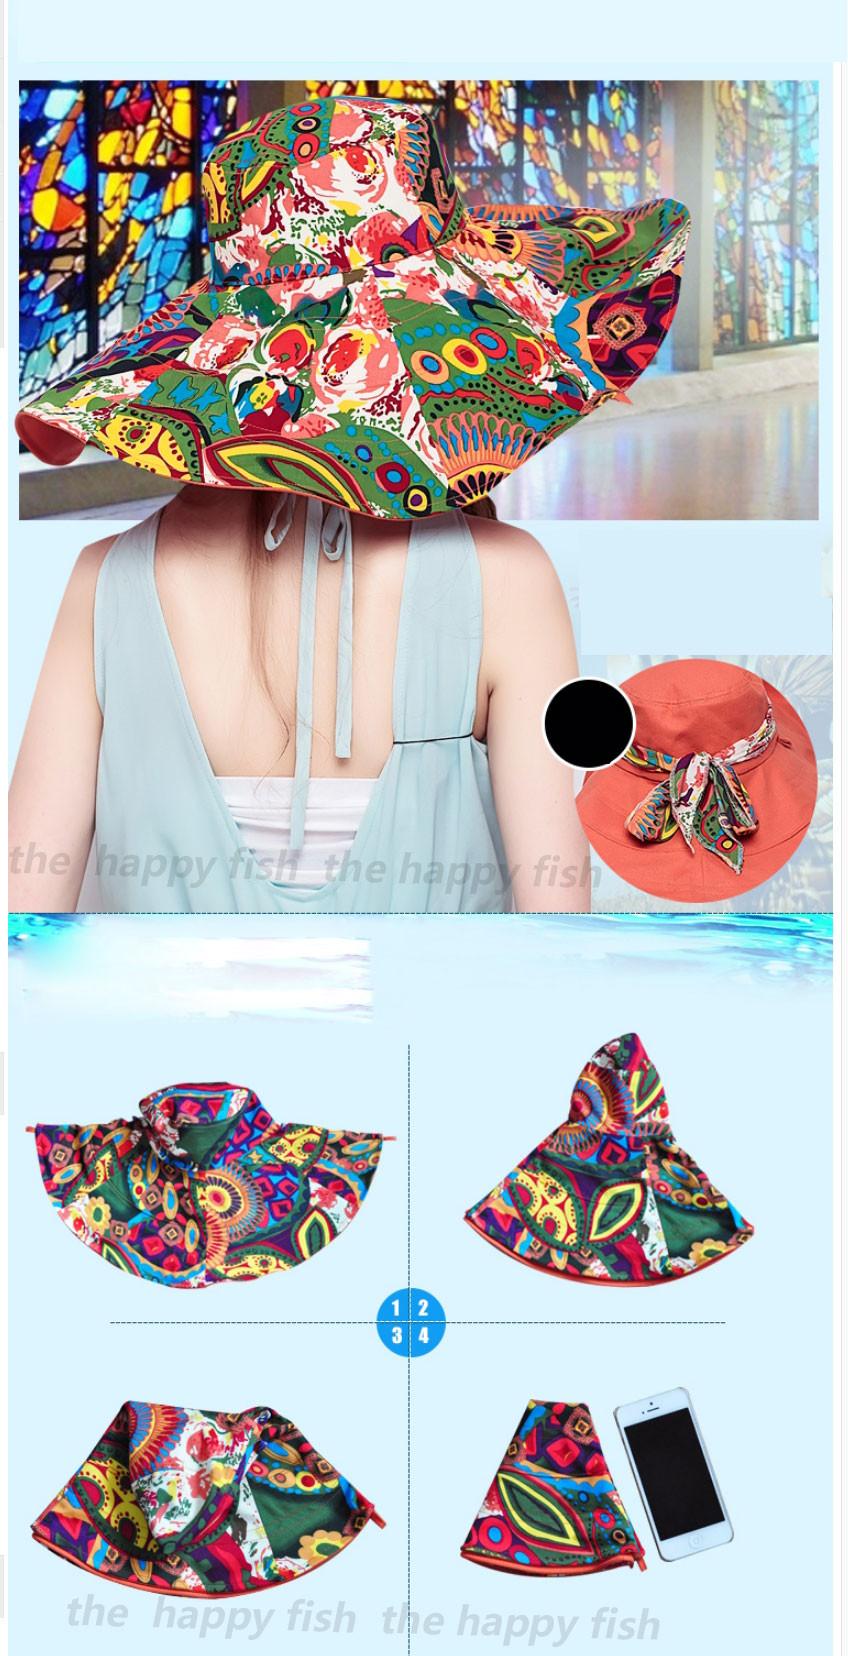 Bohemian Style! Hats Sun Hats For Women Summer Hat For Women Large Sun Hat Beach Hat chapeu femme feminino Flower printed (6)